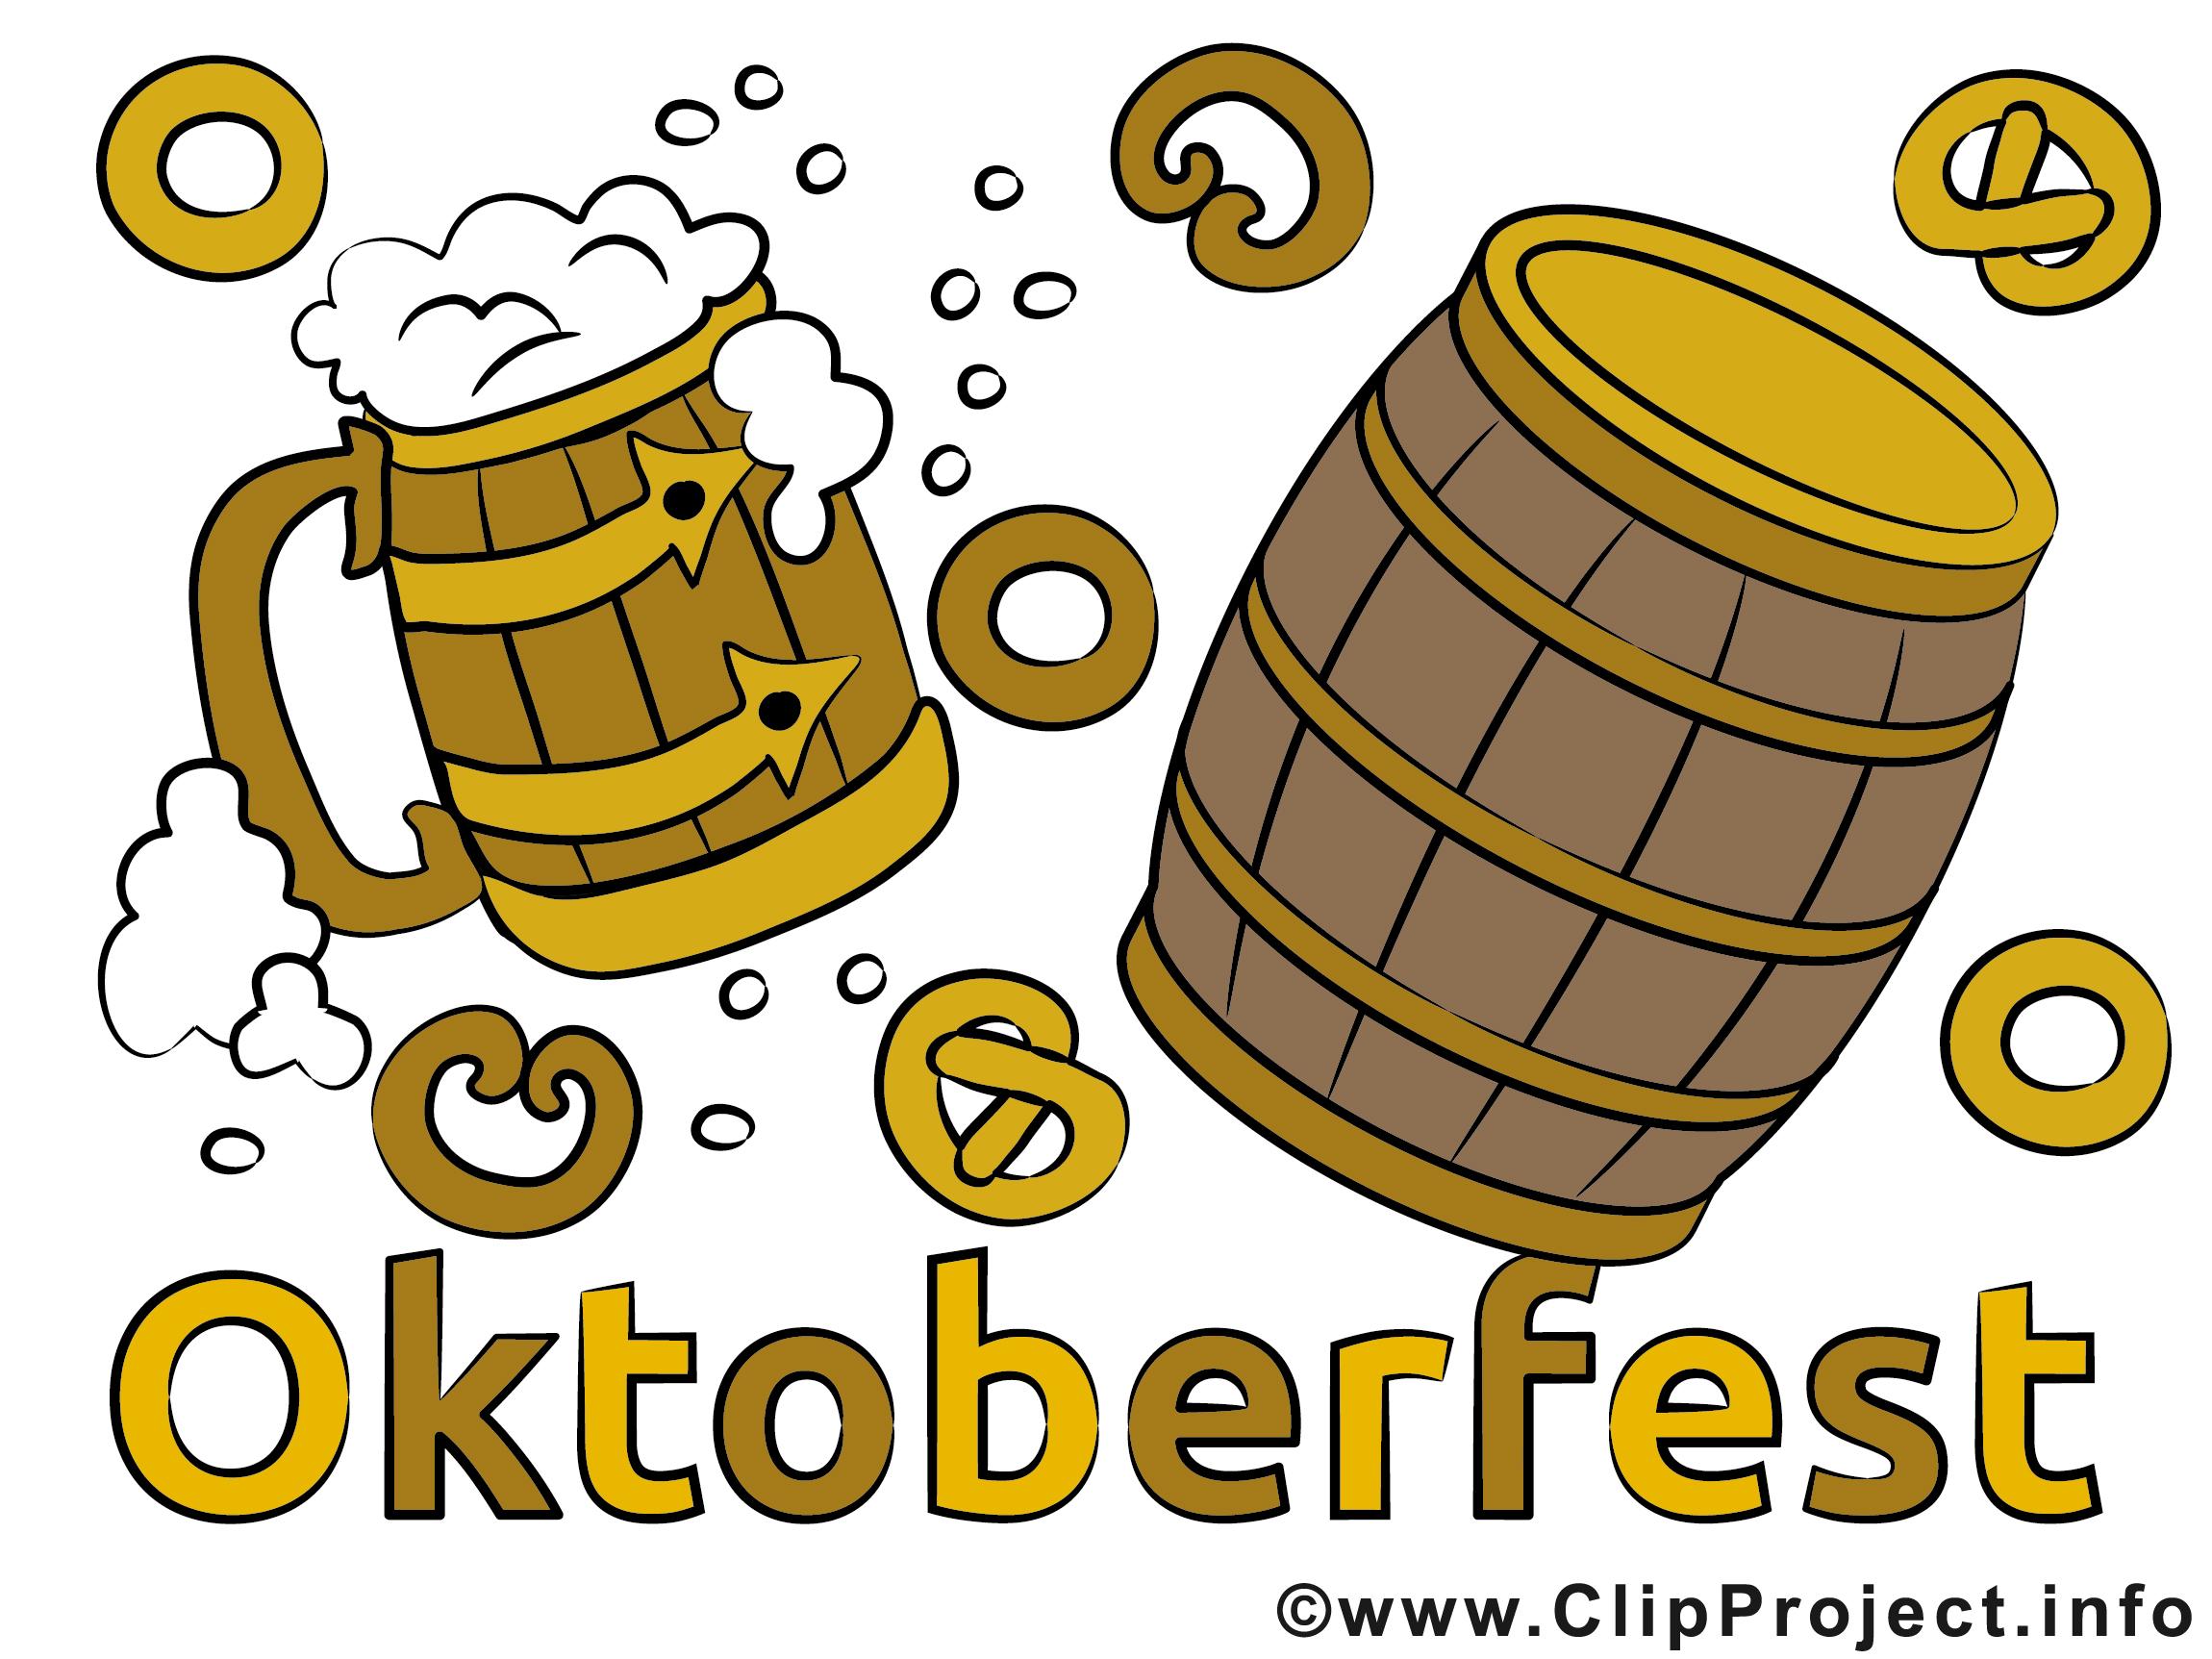 Clipart oktoberfest kostenlos clip transparent Oktoberfest Bilder, Cliparts, Cartoons, Grafiken, Illustrationen ... clip transparent